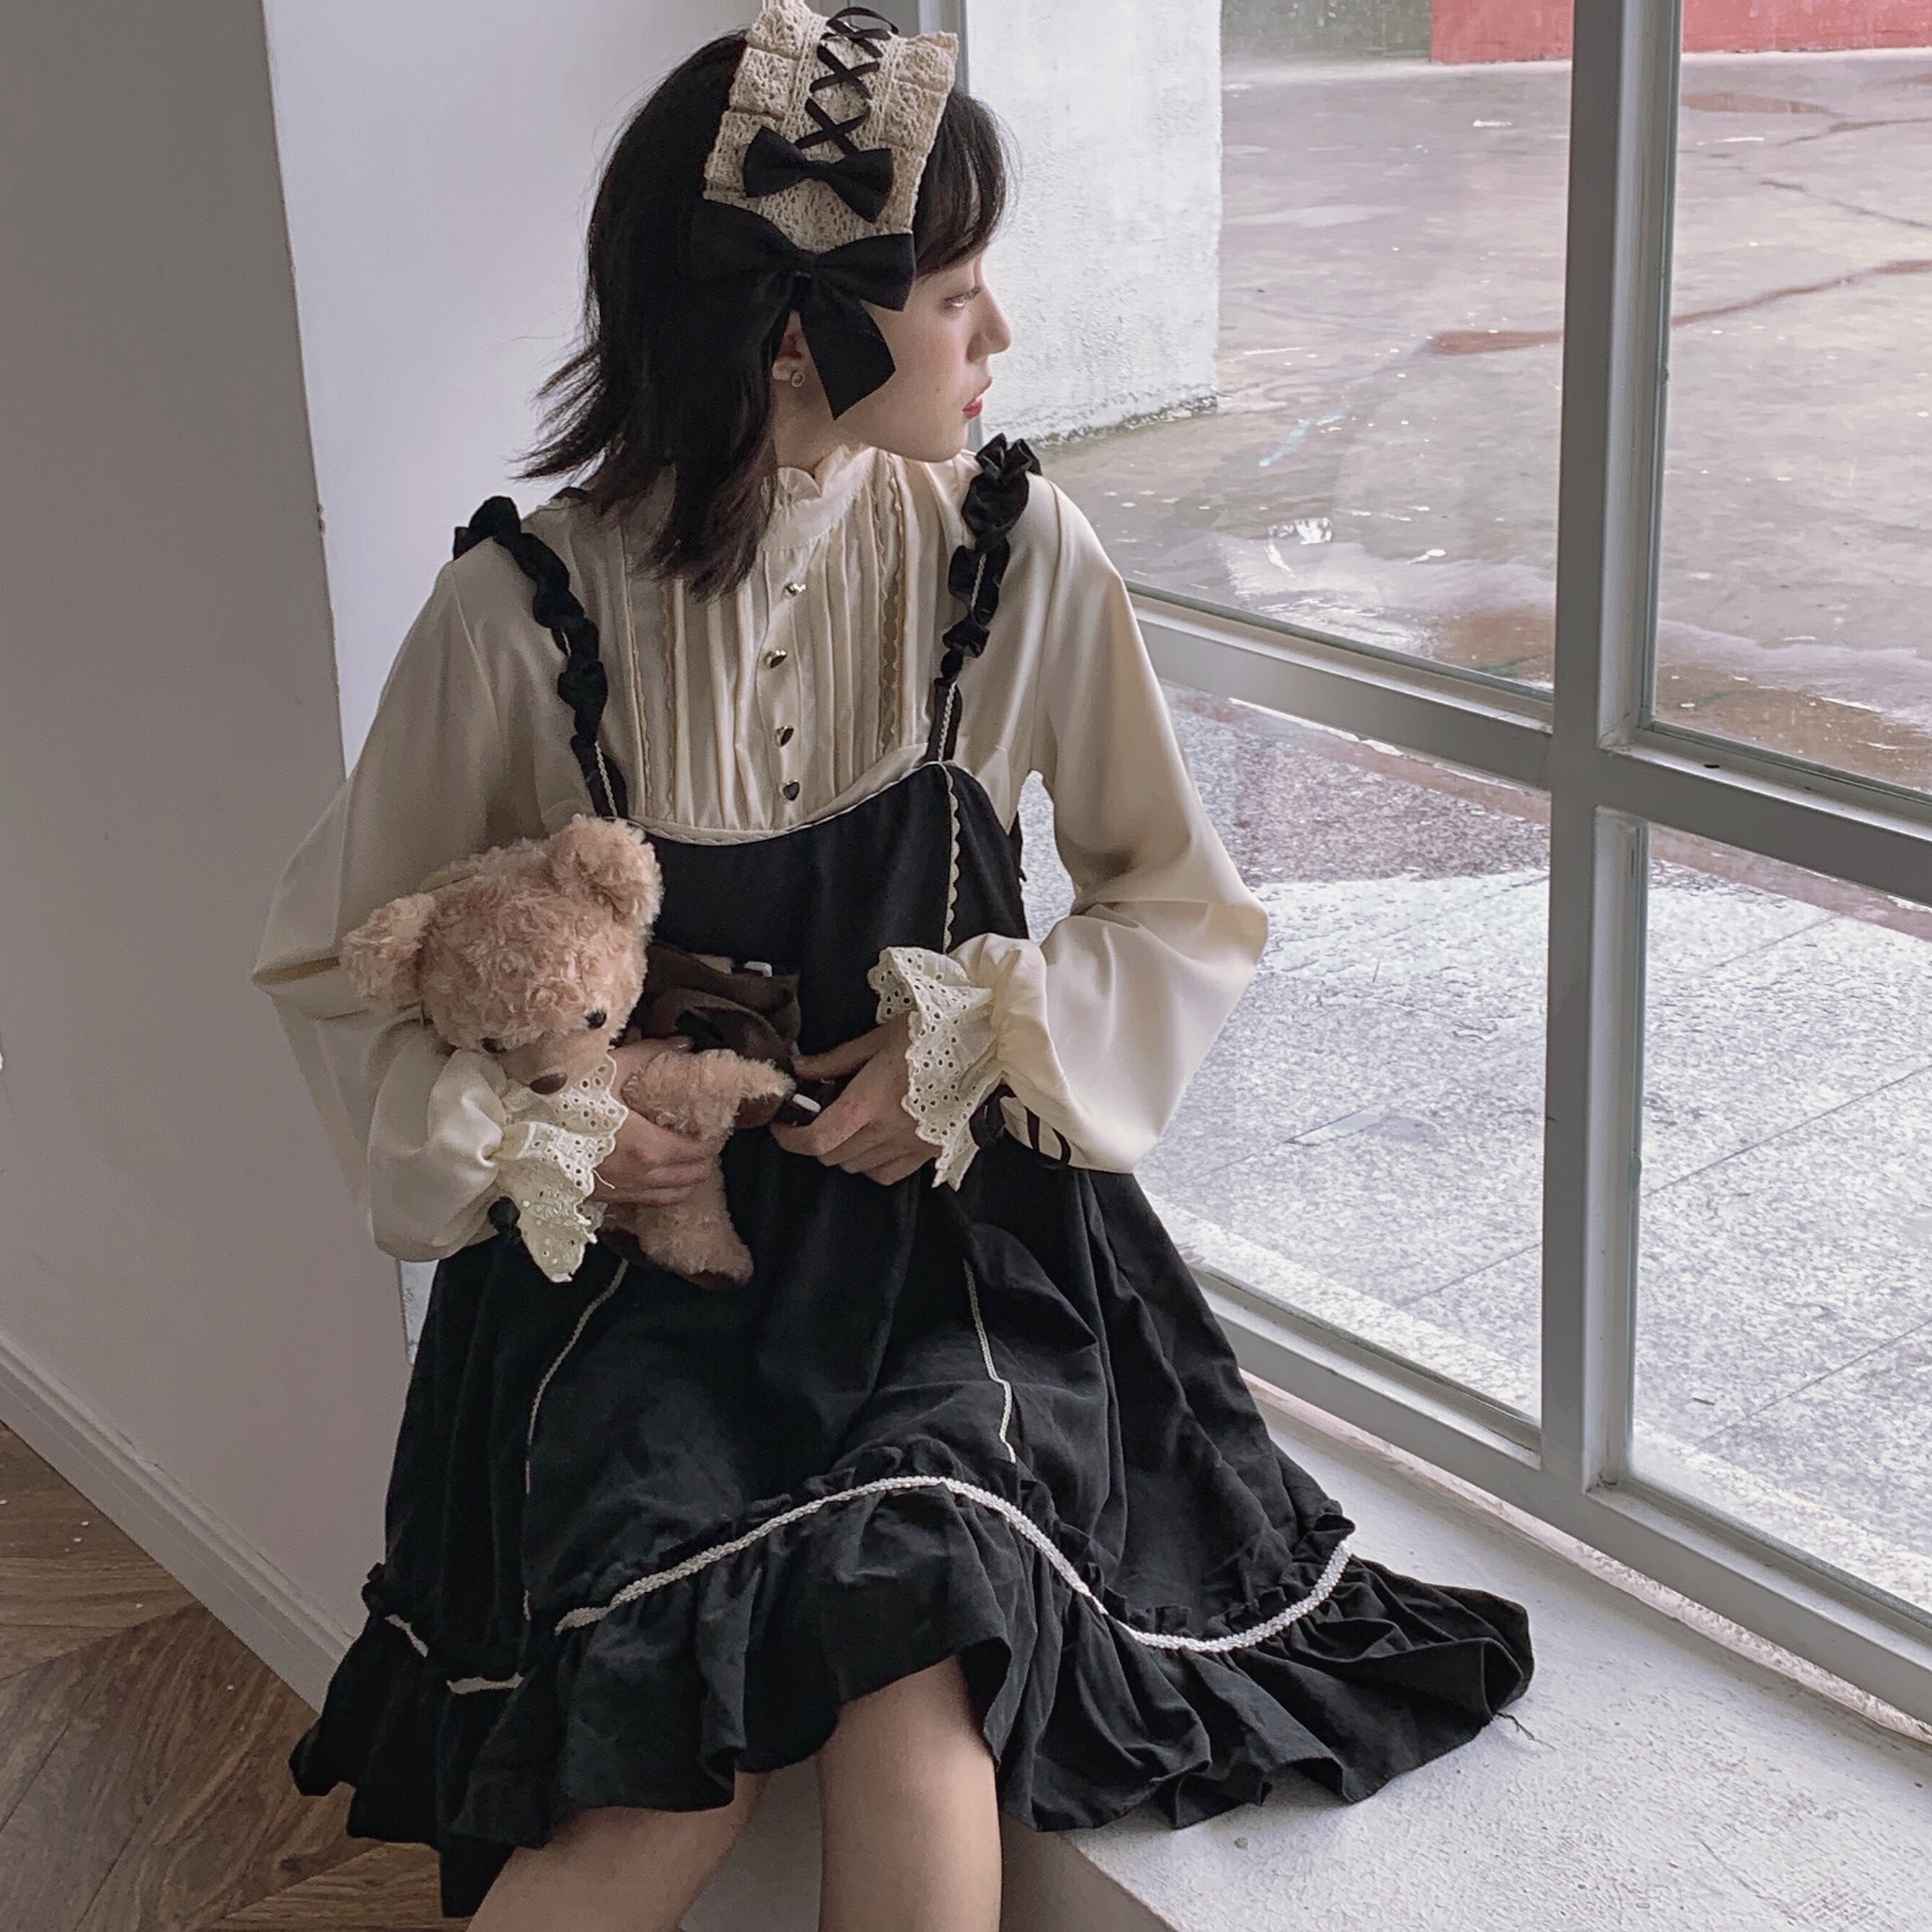 aWomen Lolita Style Party Dresses Japanese Korean Harajuku Gothic Bandage Bow Patchwork Girl Cosplay Dress Kawaii Ruffles Dress